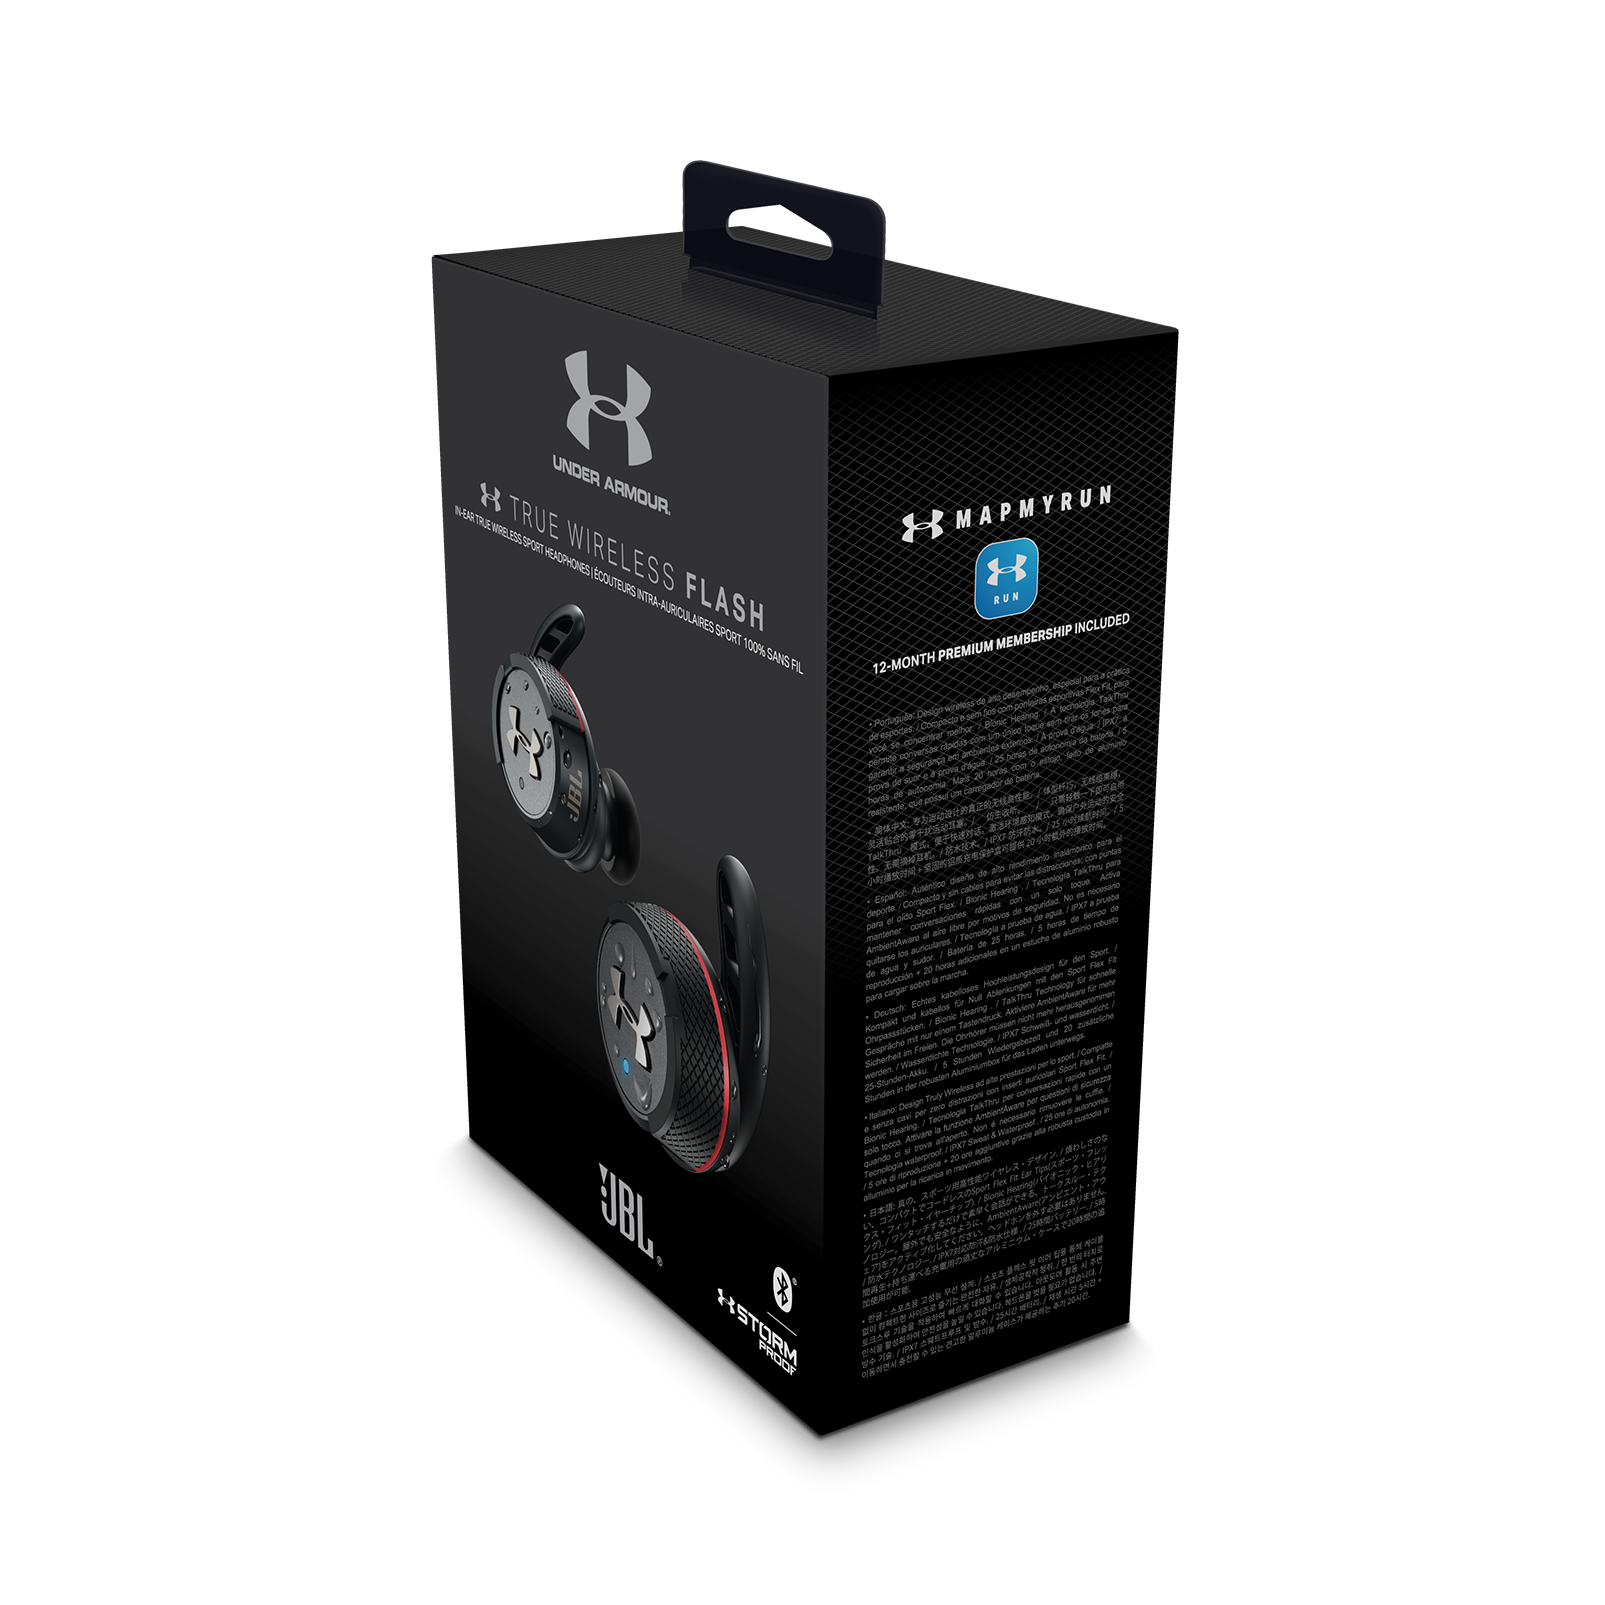 Under Armour® True Wireless Flash – Engineered by JBL®